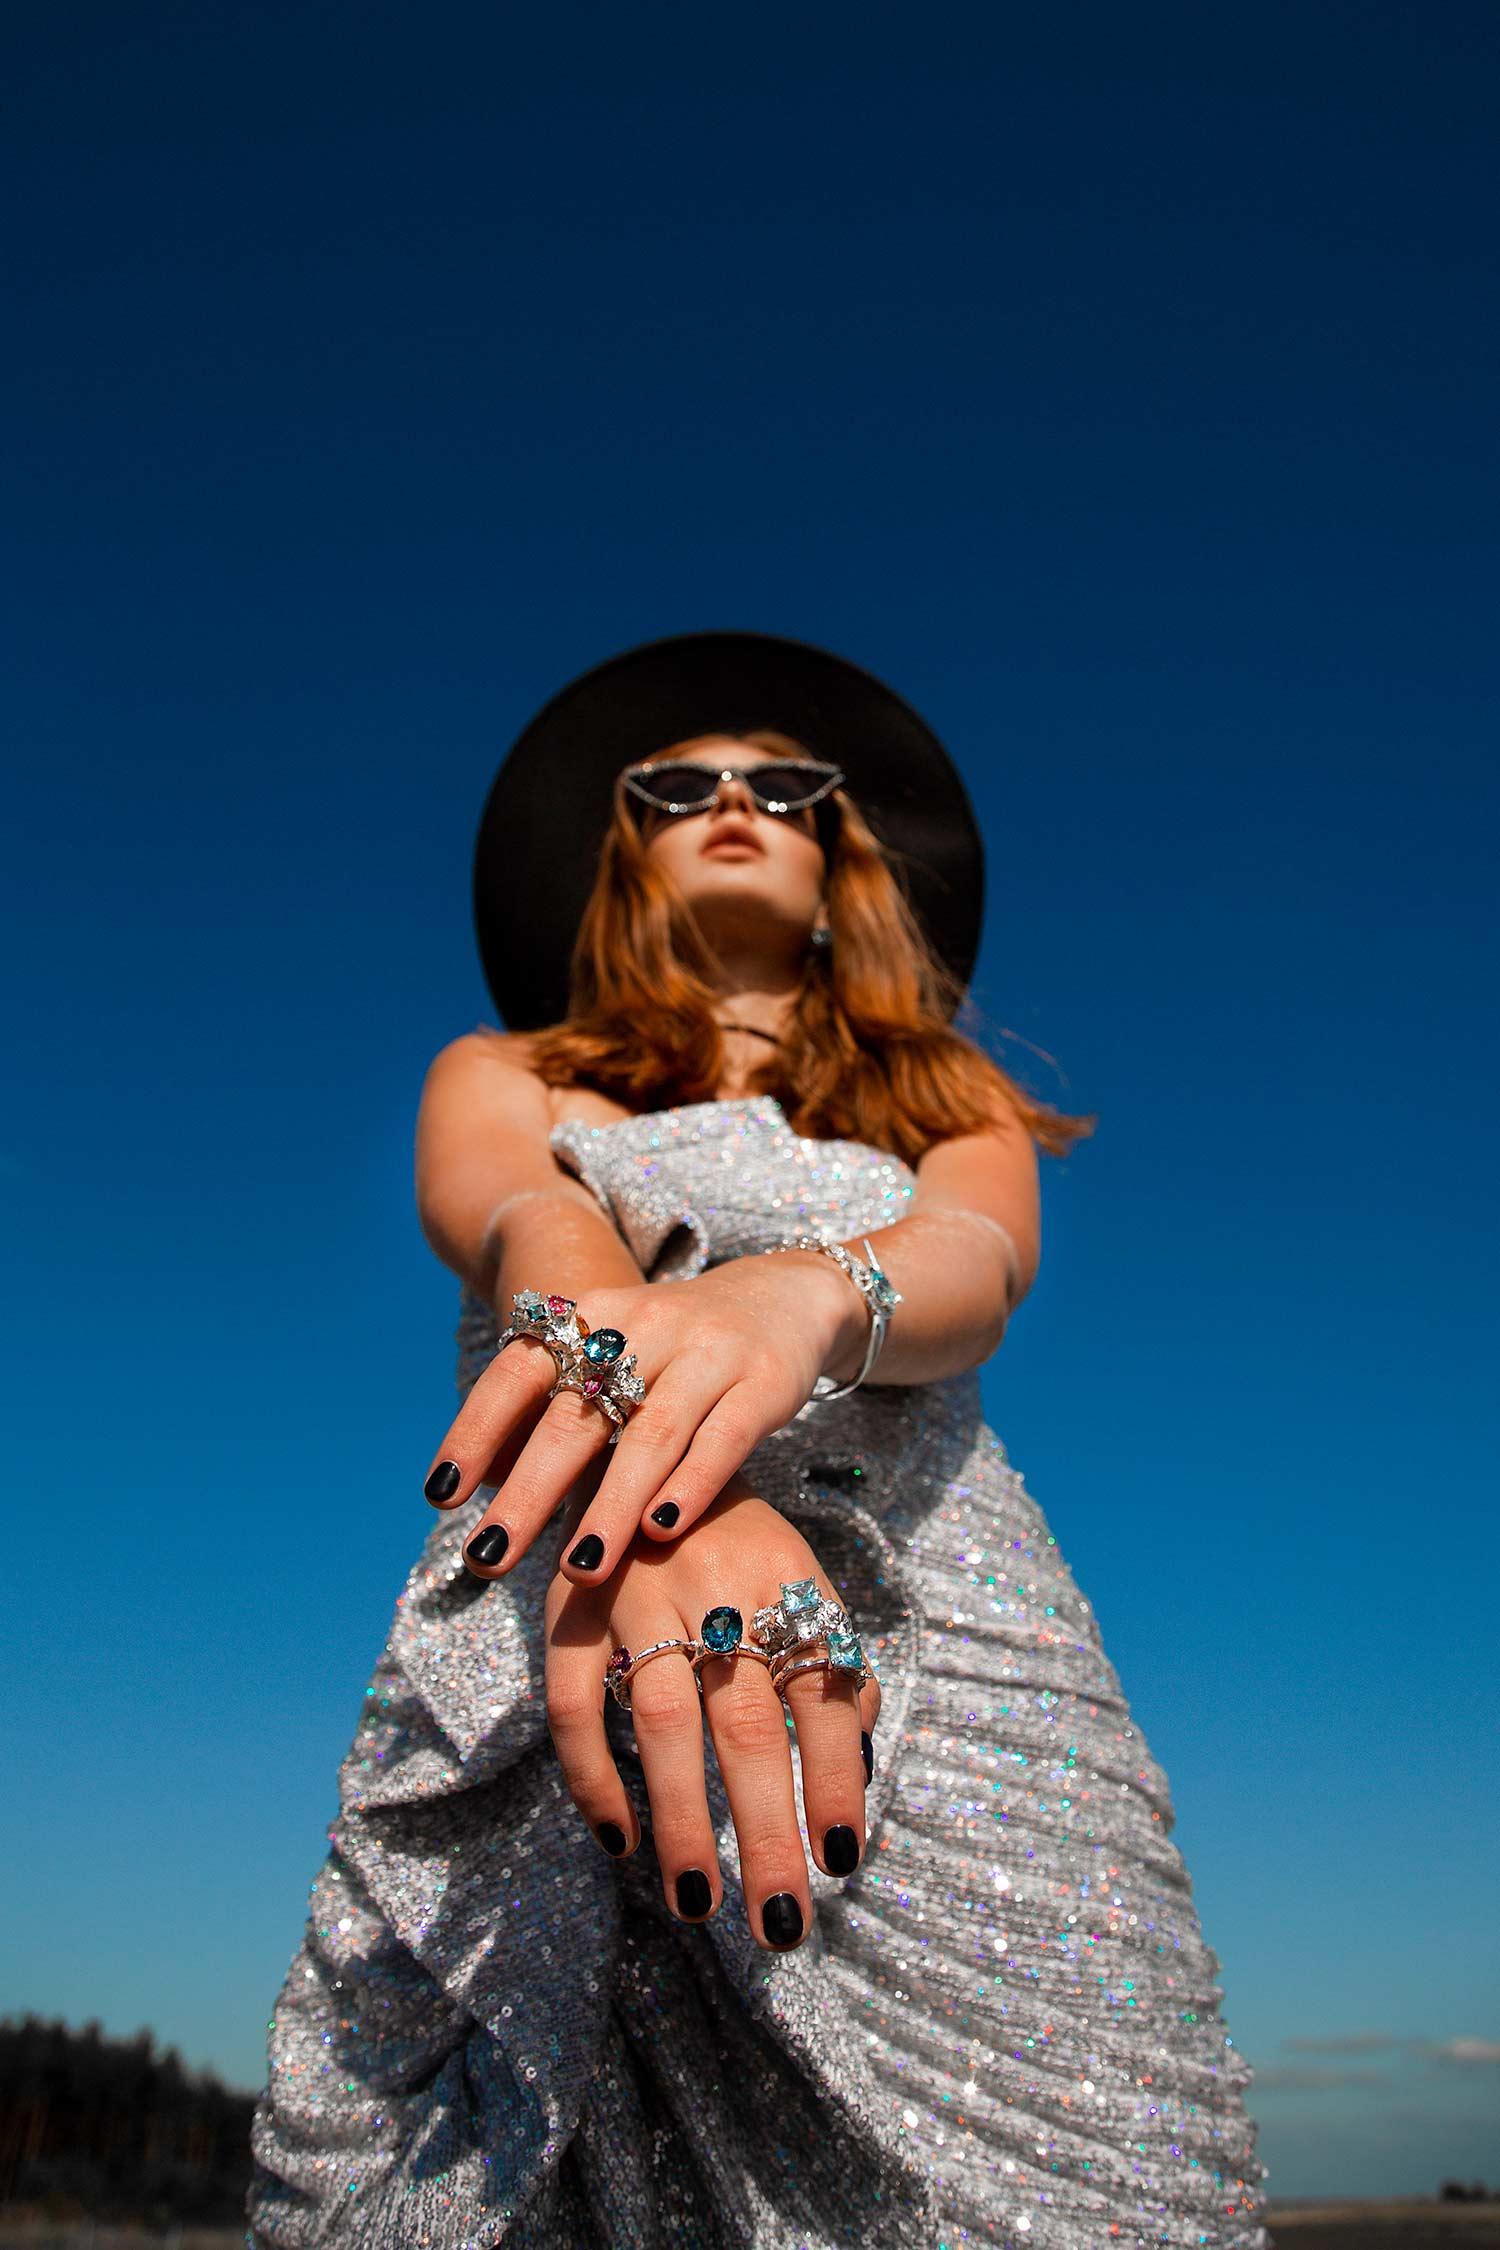 Model wearing cowboy hat, sunglasses, shiny dress and Zydrune gemstone rings and bracelet.